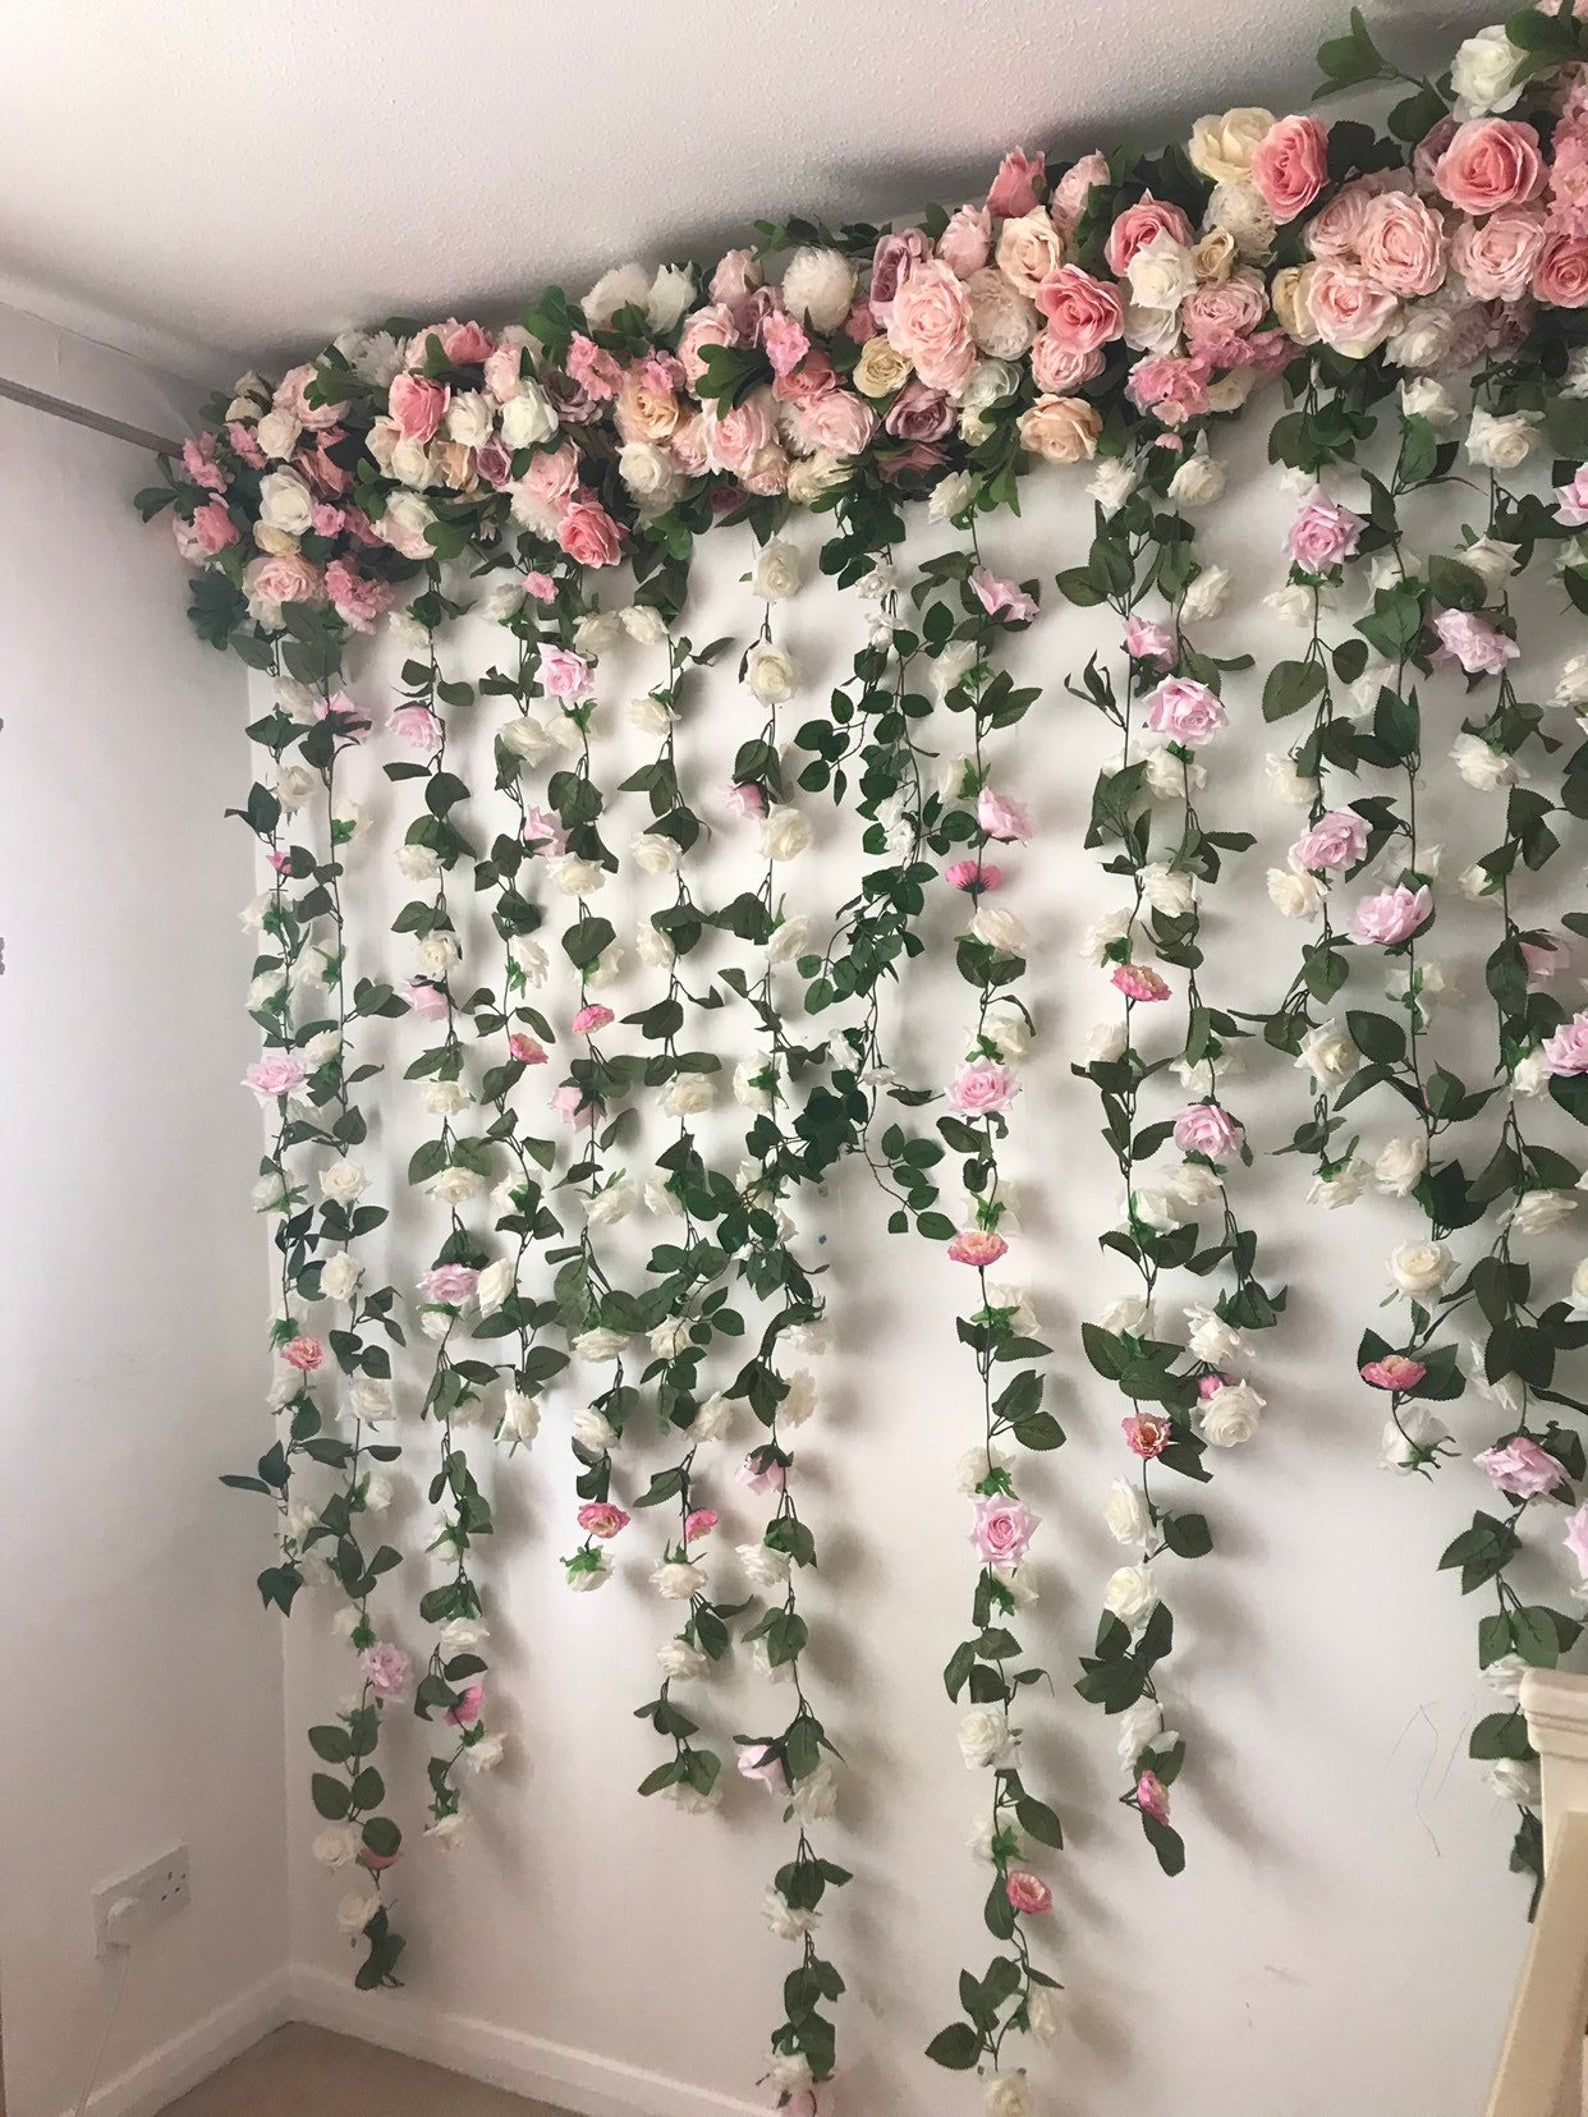 Flower Garland Flower Wall Floral Garland Wedding Wall Etsy In 2020 Flower Wall Backdrop Wedding Wall Wall Backdrops